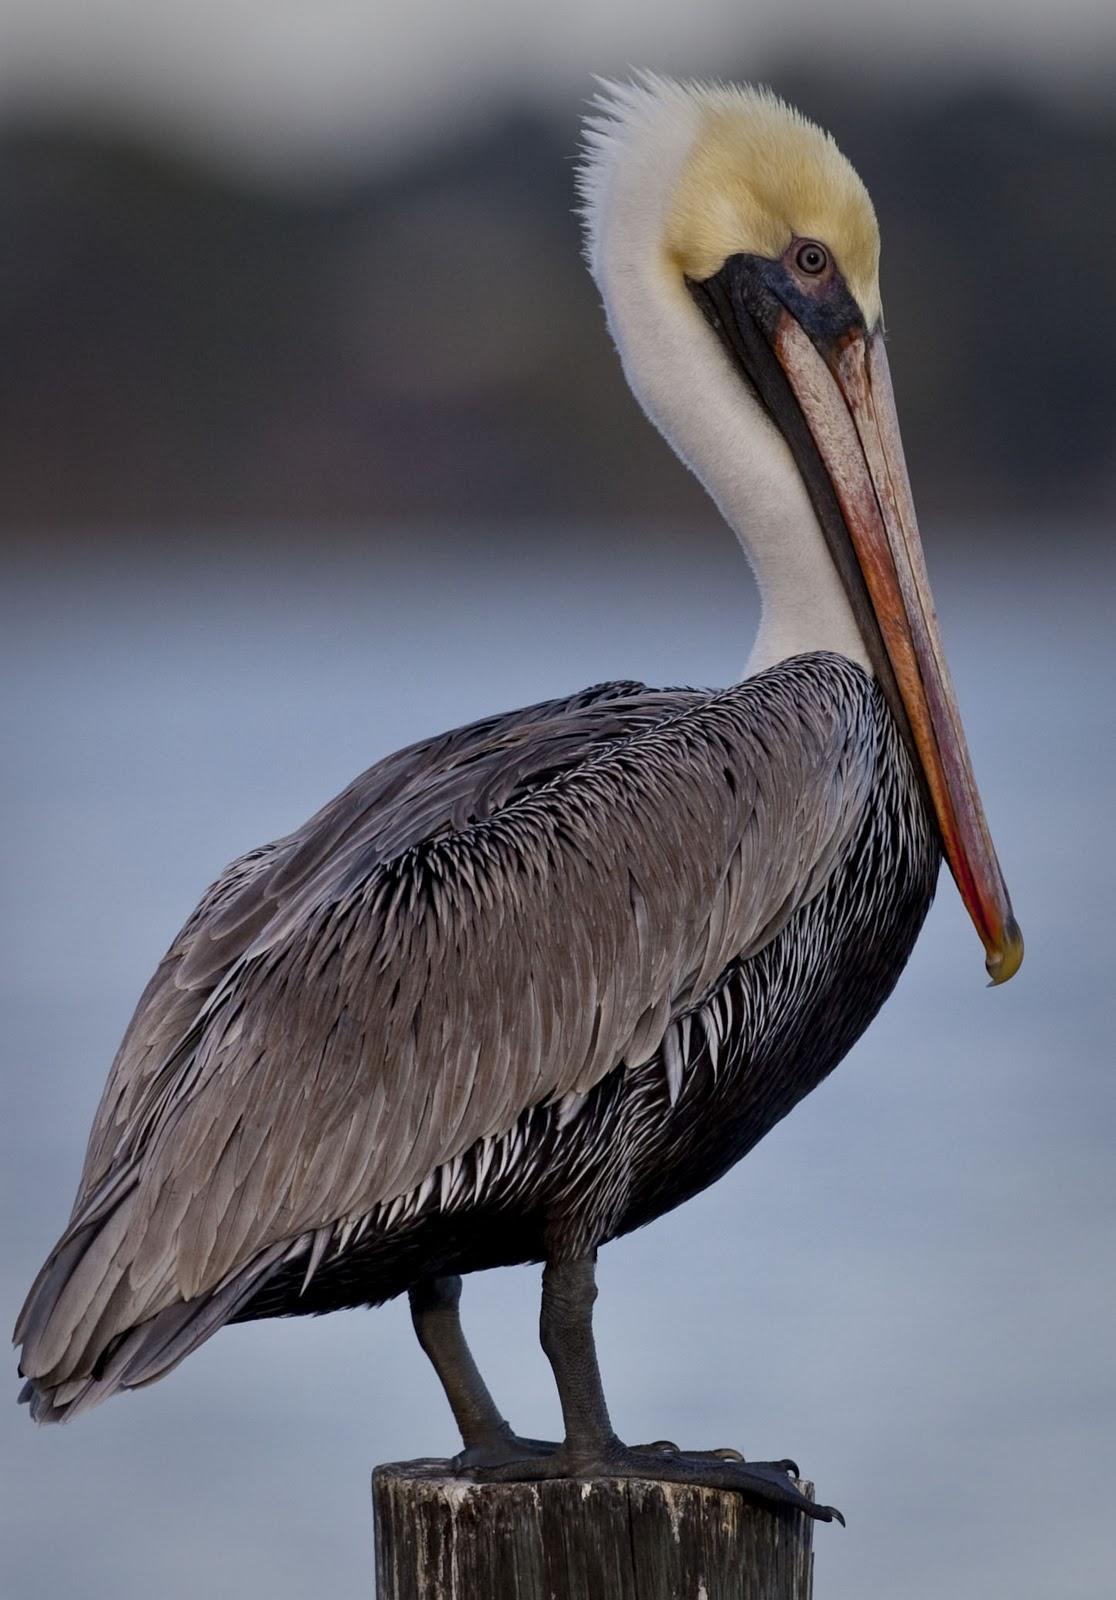 Brown Pelican Not Always Brown But Still A Spectacular